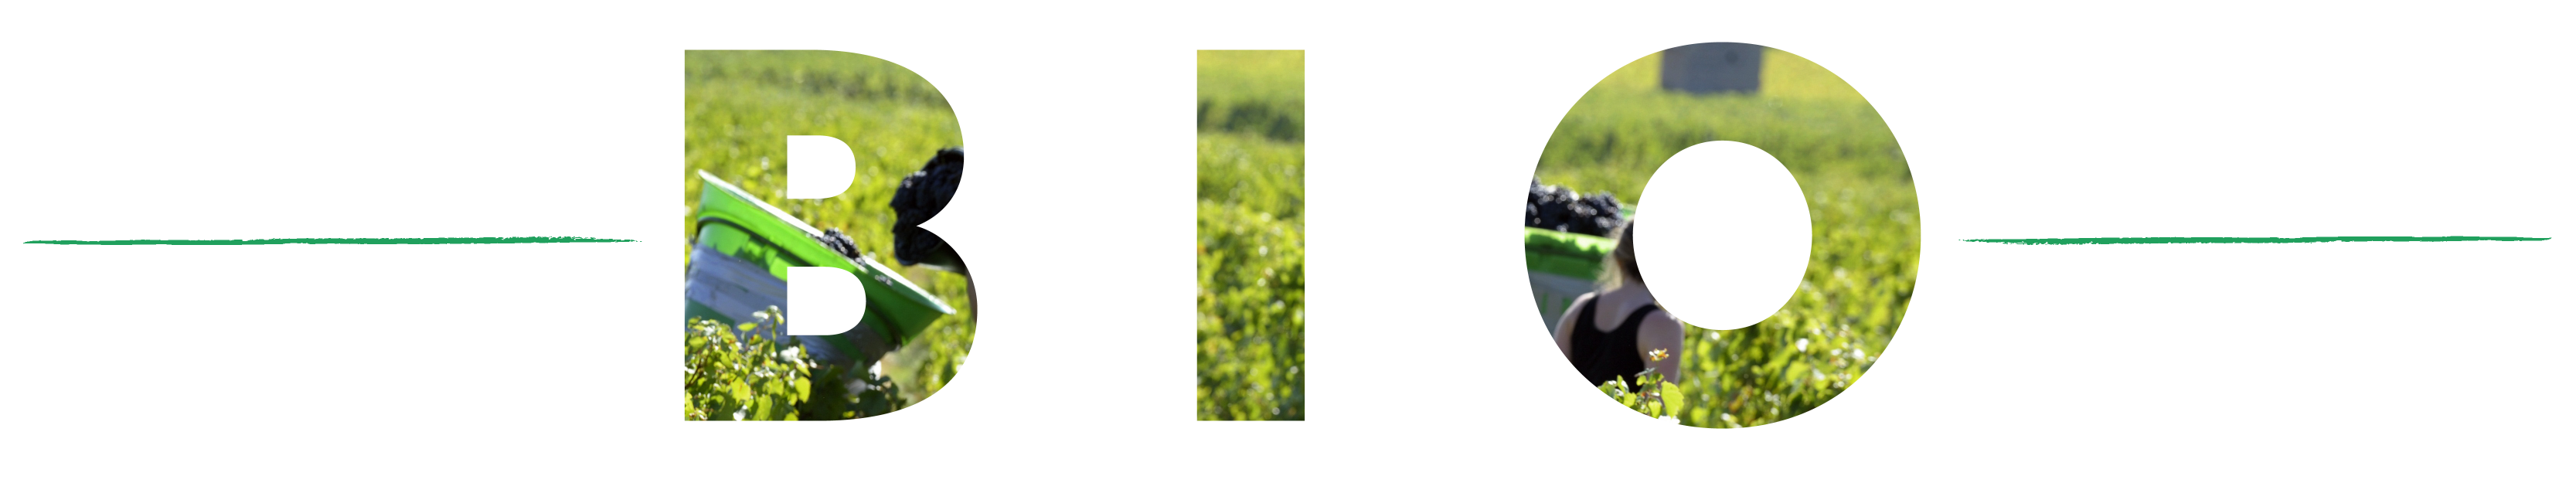 banniere-transition-bio